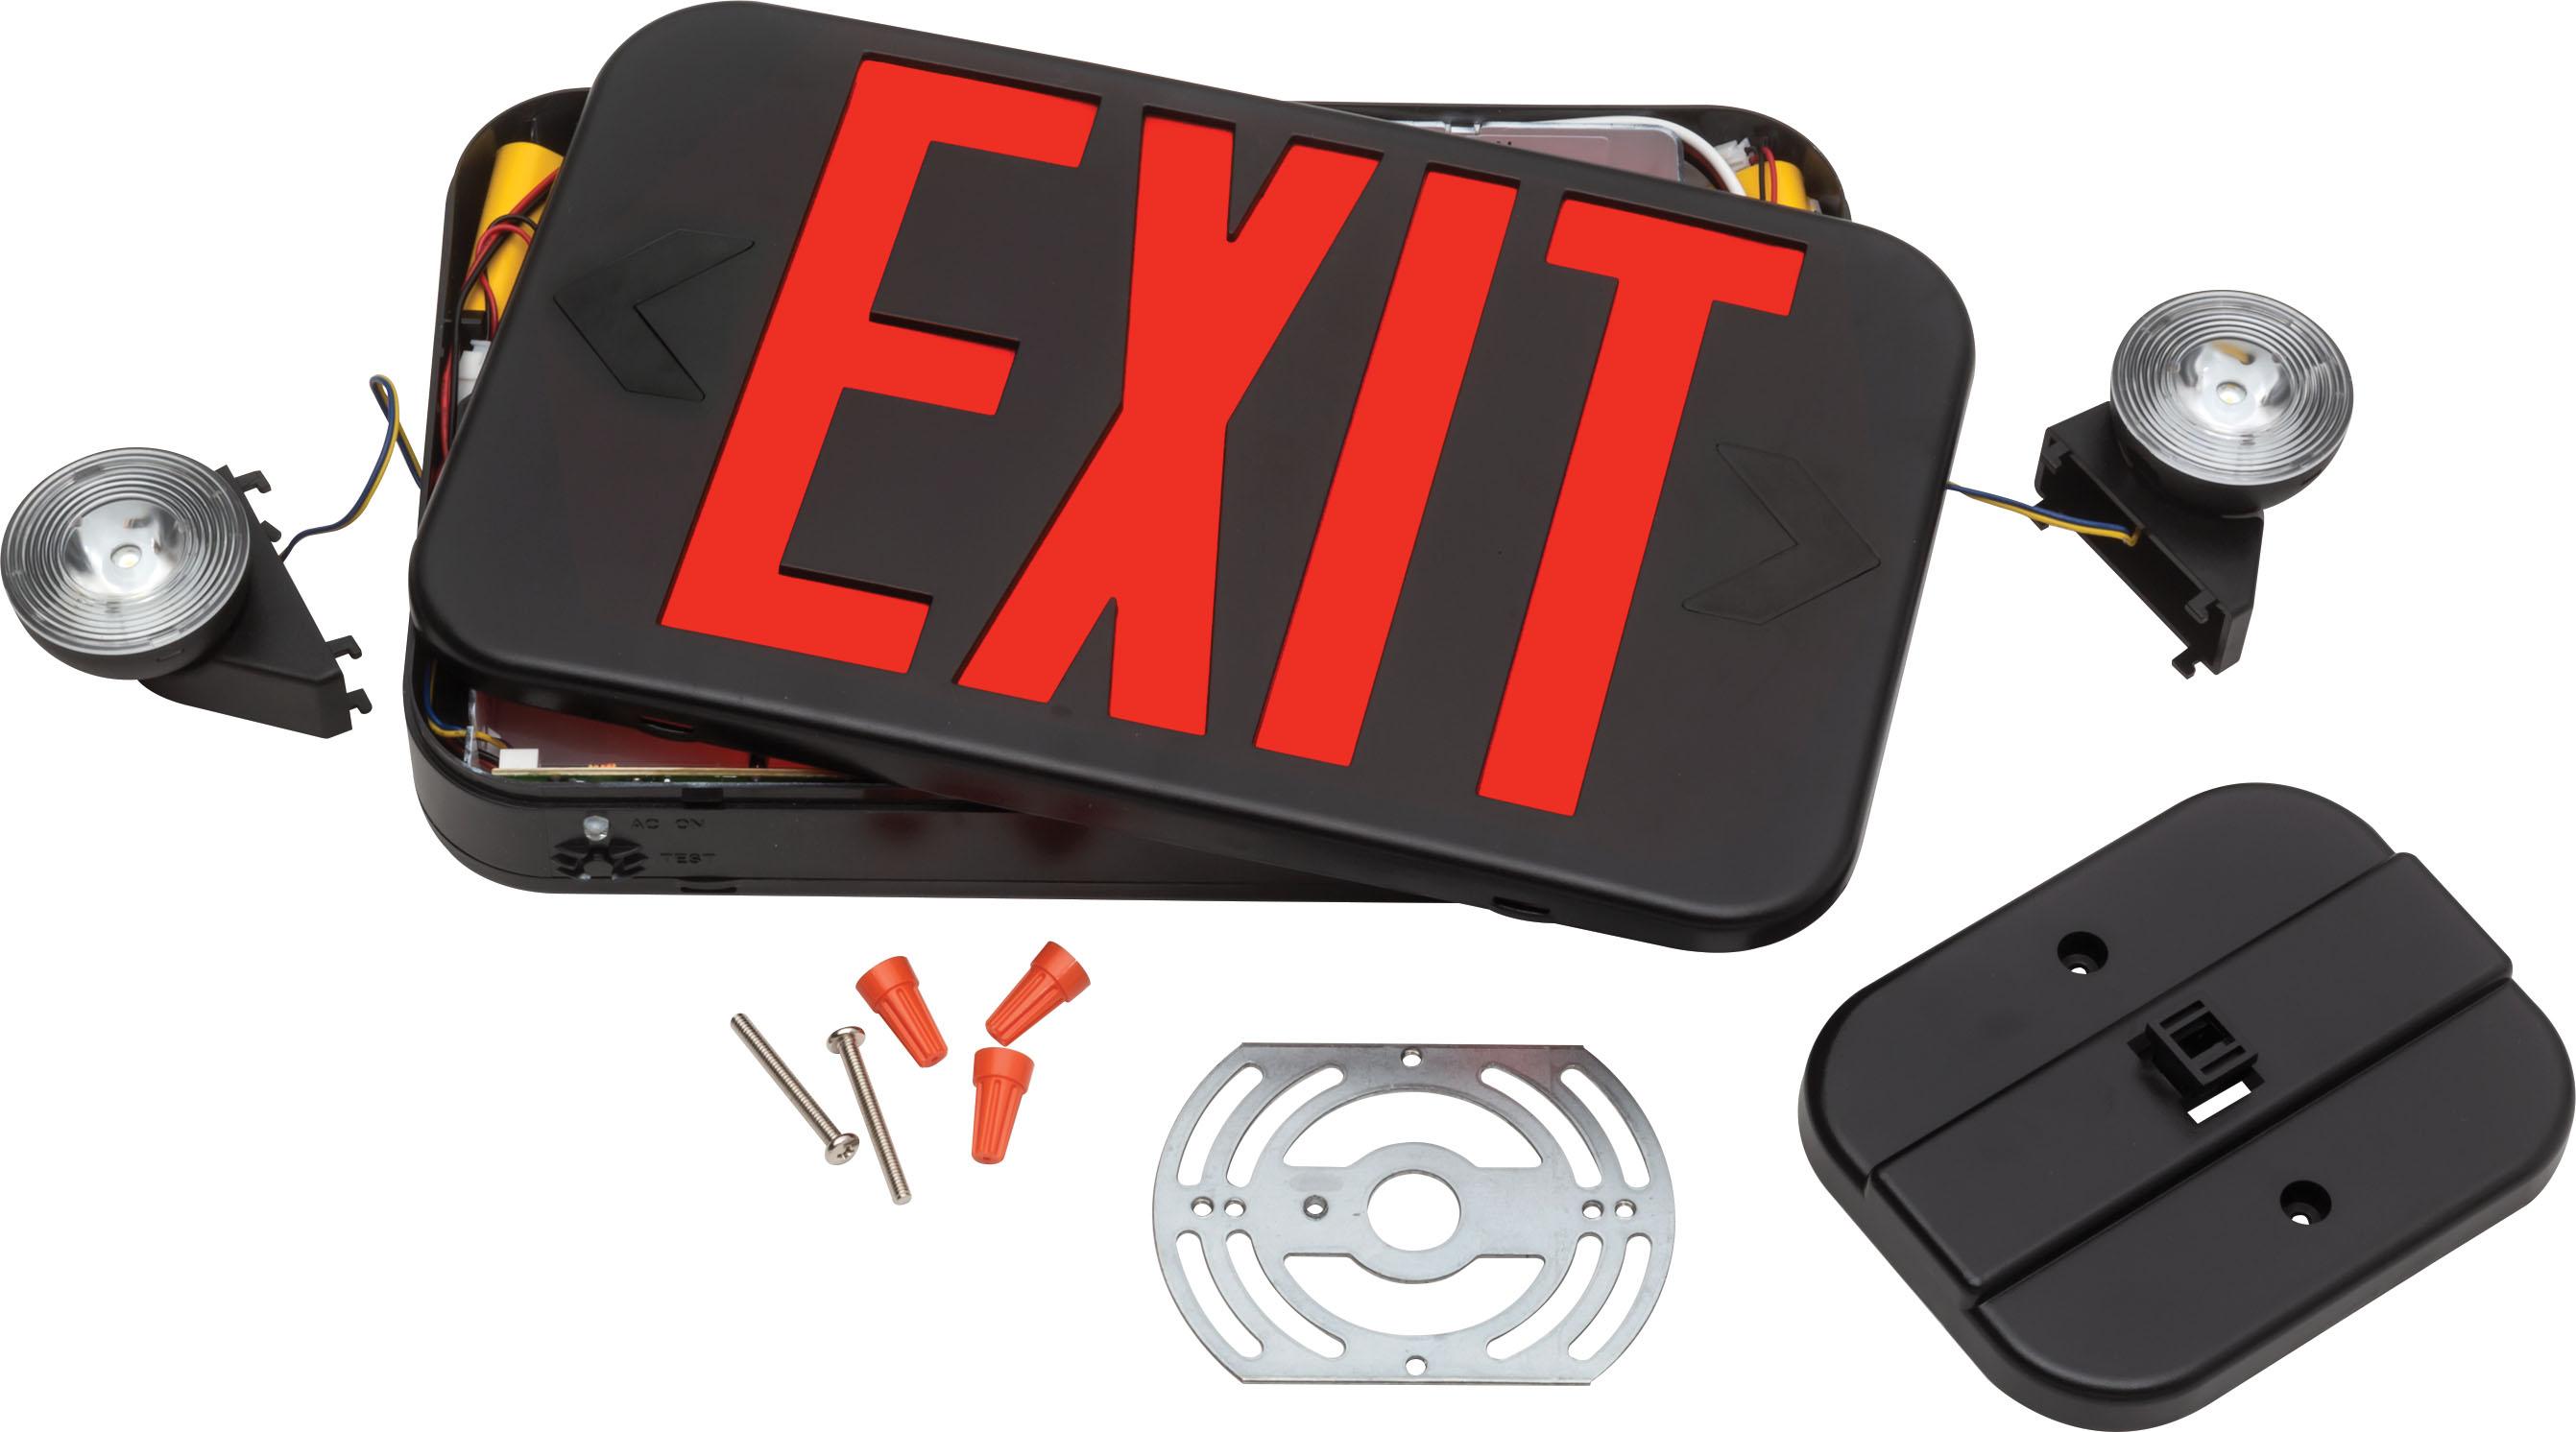 ECC B R M6_Packaging Components_002.jpg